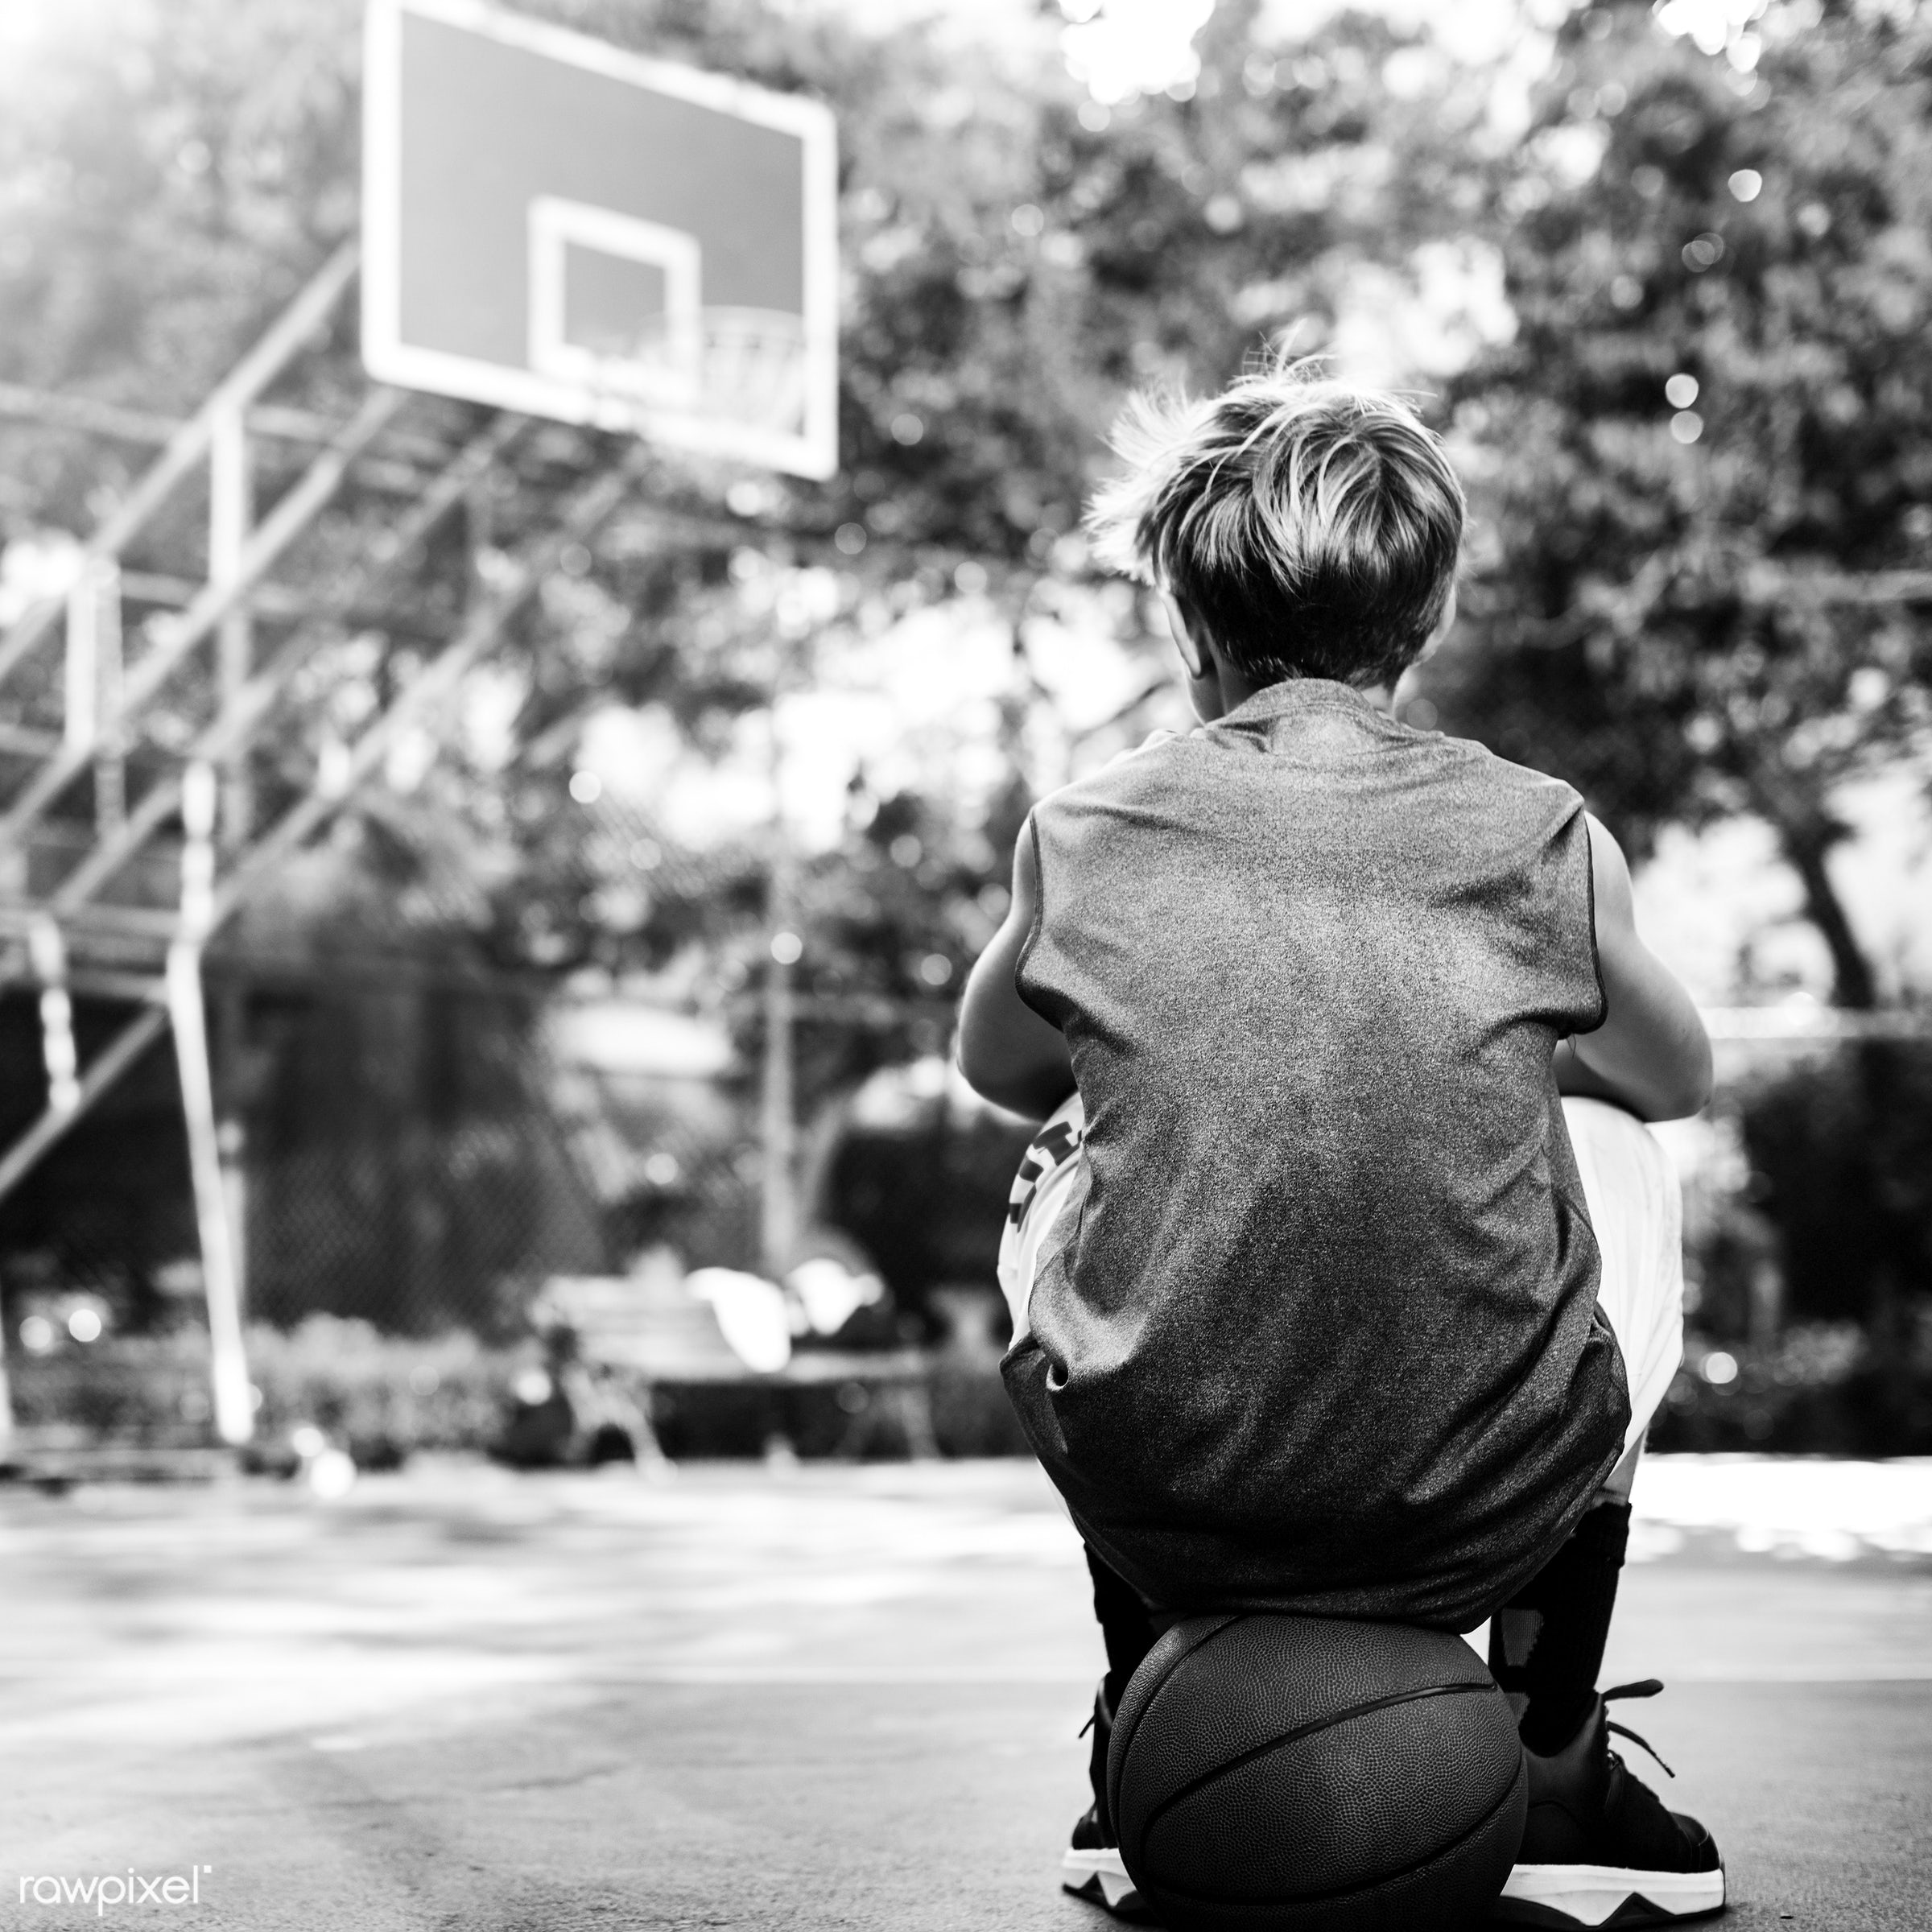 Young basketball player shoot - sport, basketball, activity, ball, boy, exercise, game, man, play, player, practice, rear,...